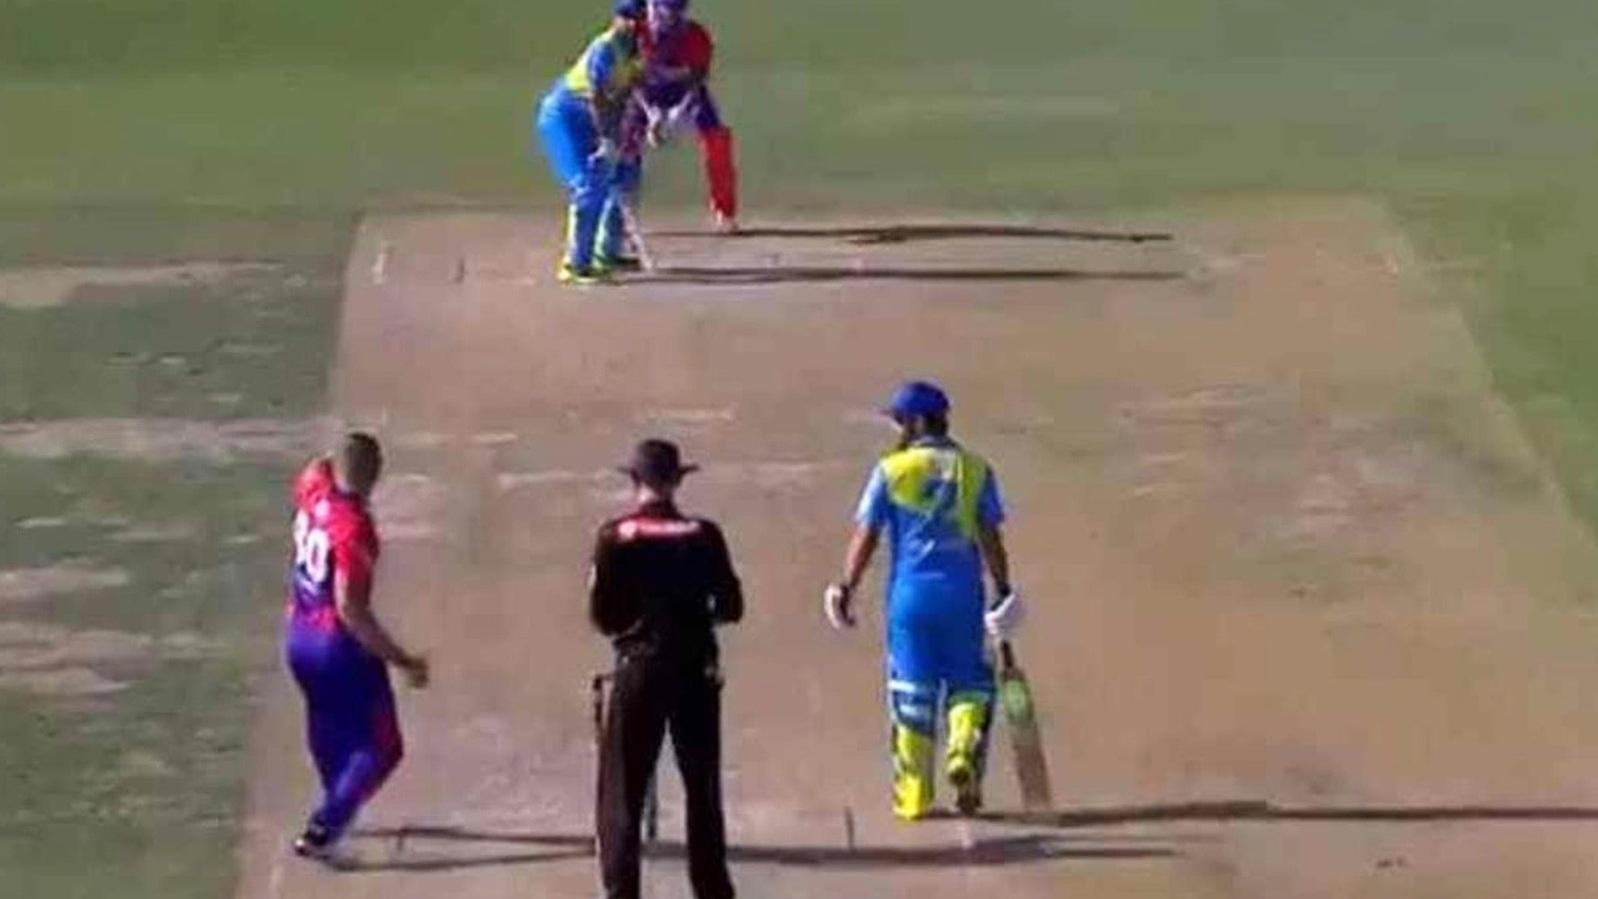 cricket.com.au - 'I love cricket': Video of Romanian bowler goes viral